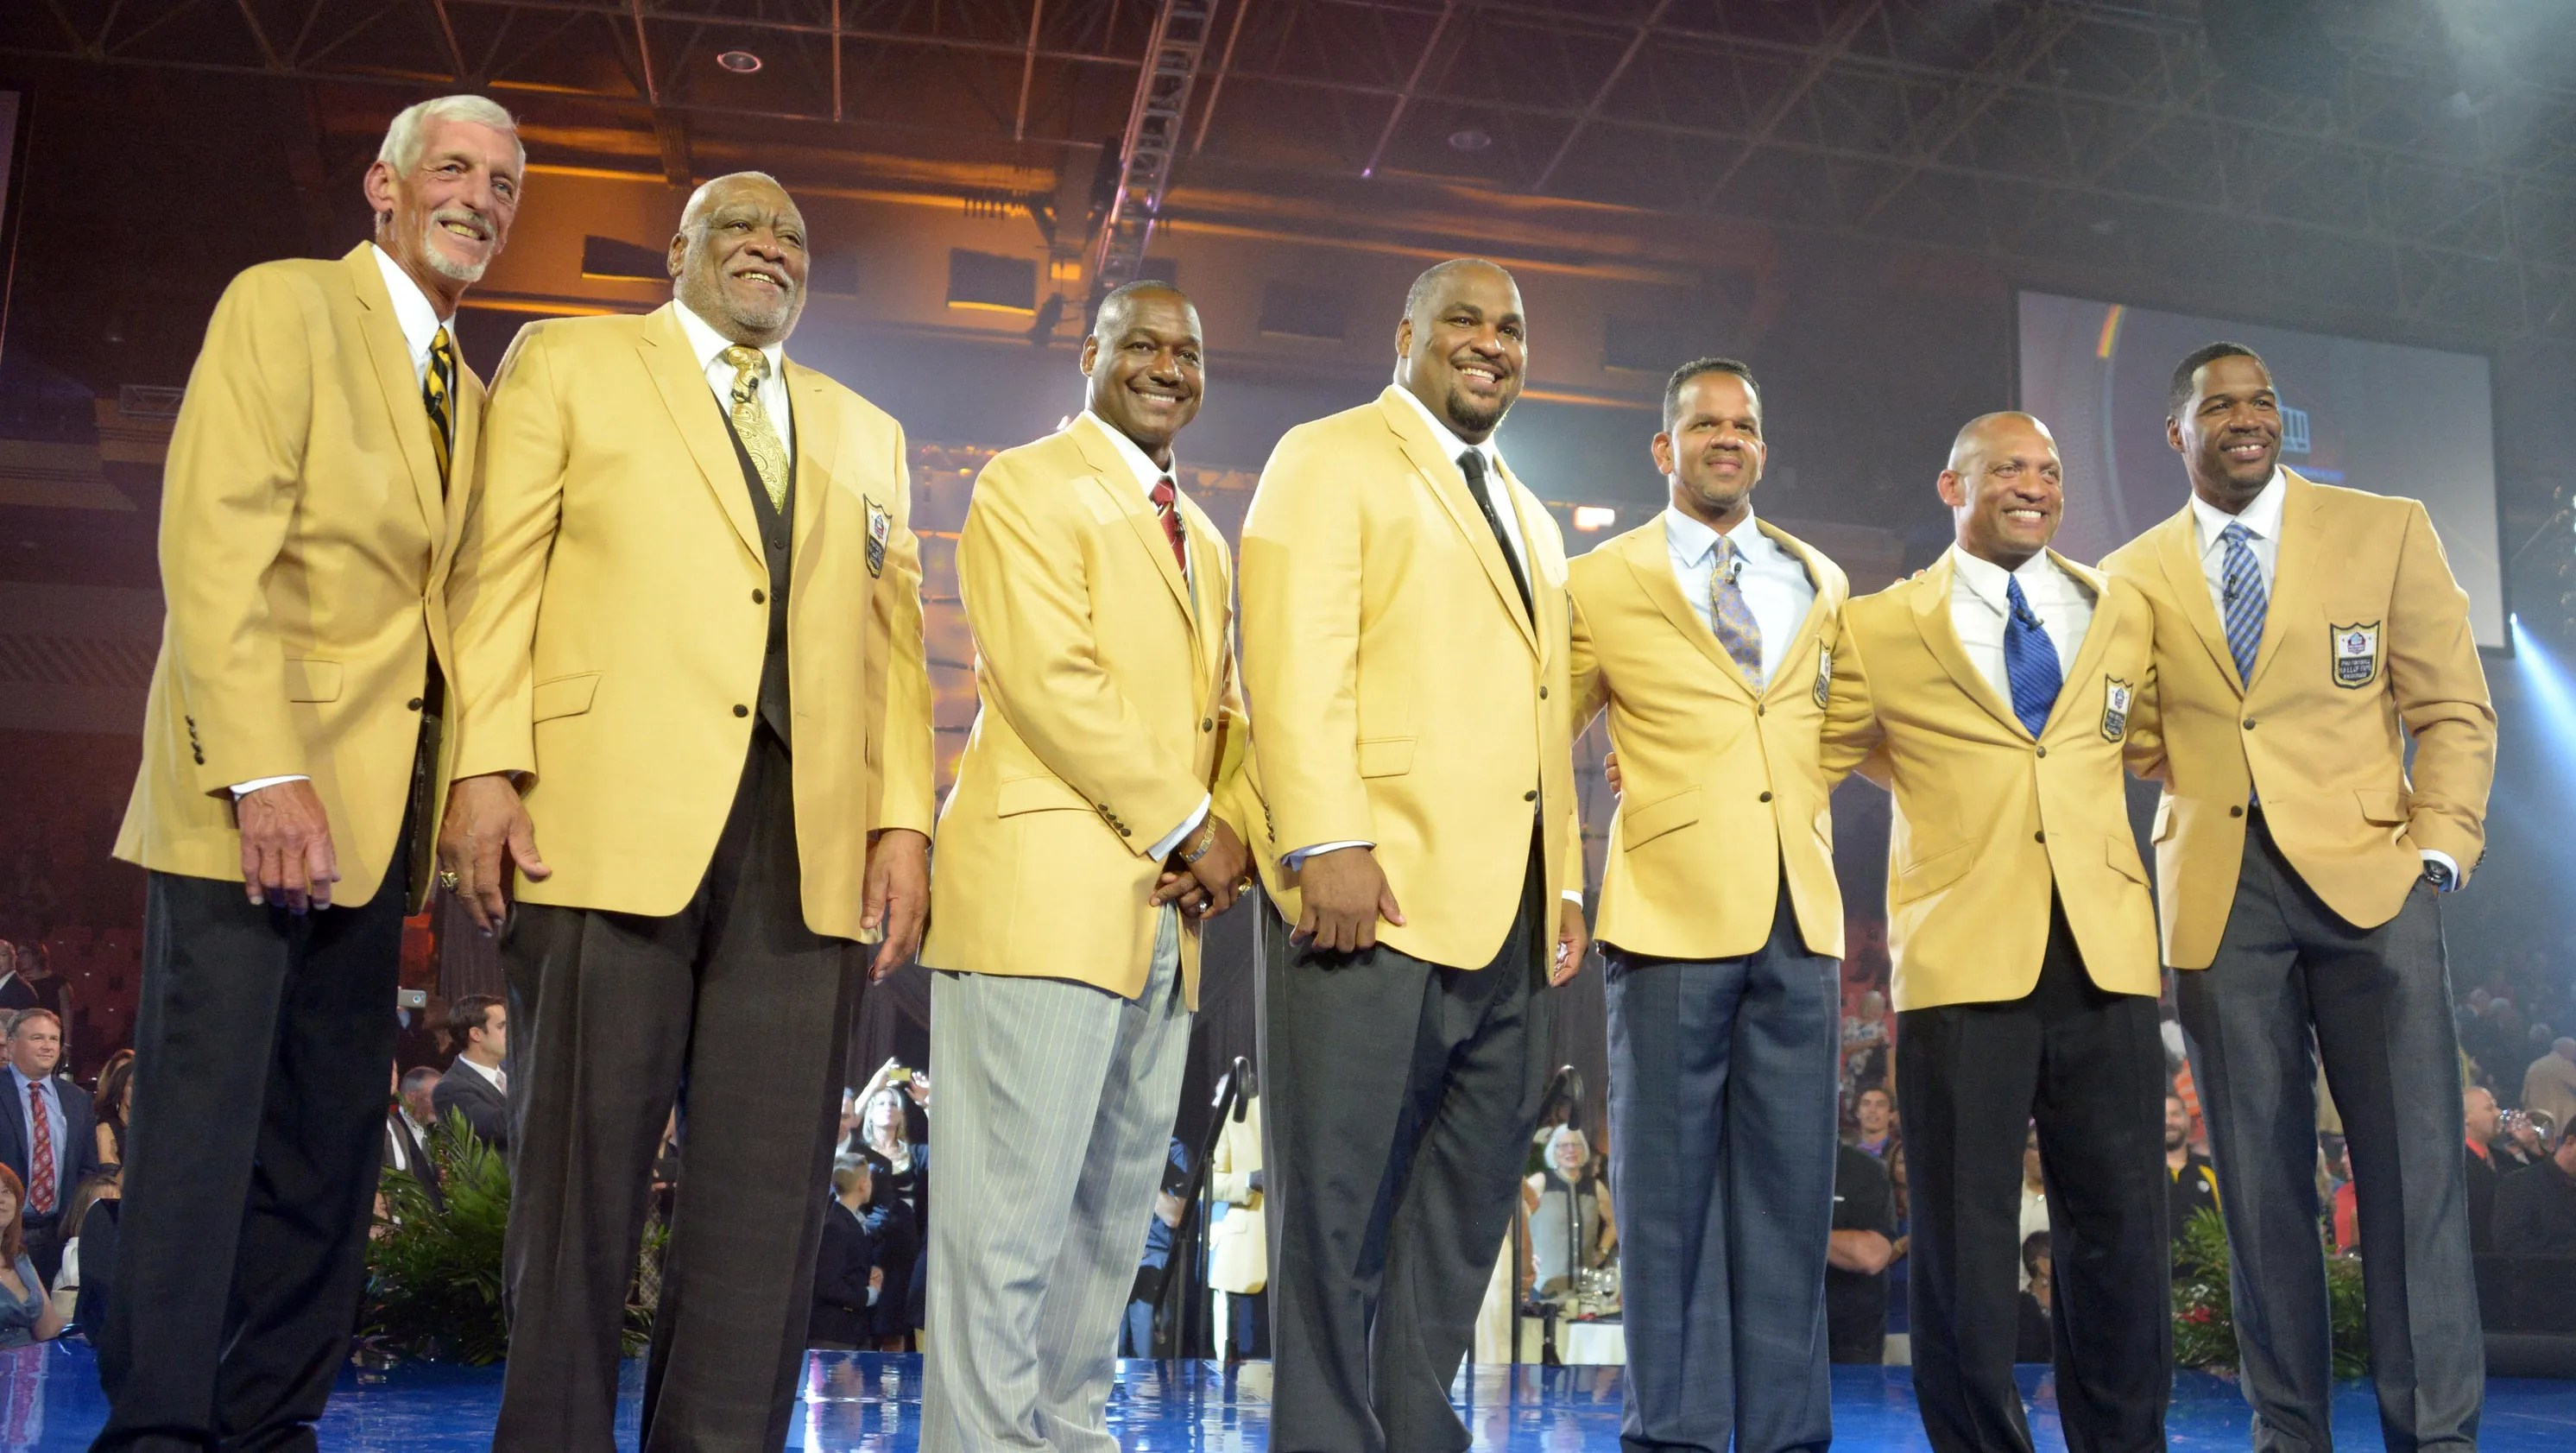 2014 Pro Football Hall of Fame gold jacket dinner